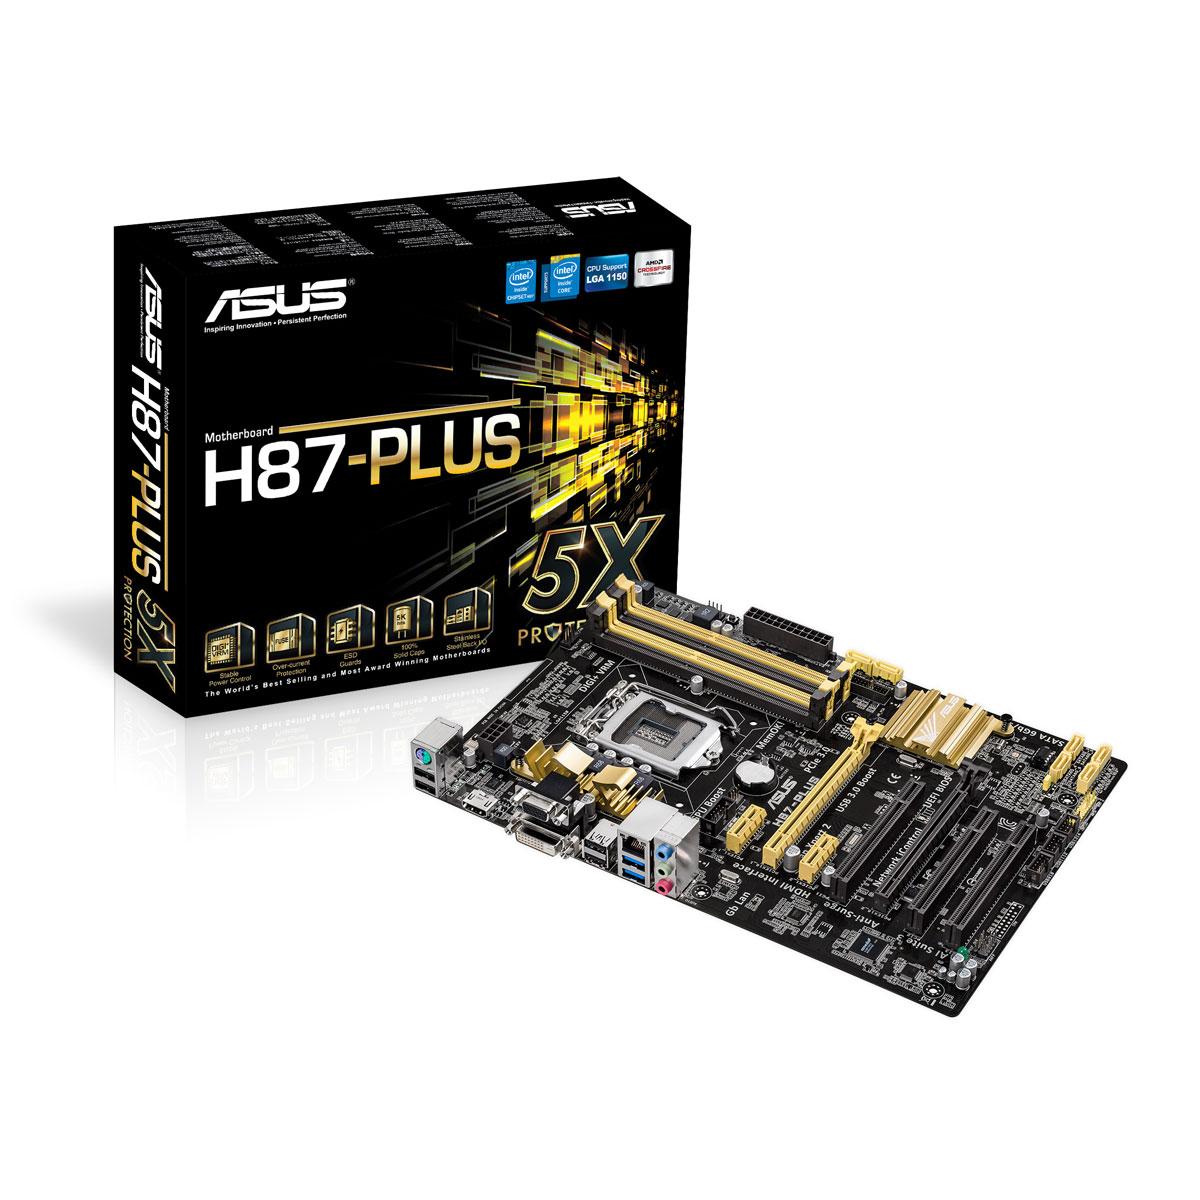 Carte mère ASUS H87-PLUS C2 Carte mère ATX Socket 1150 Intel H87 Express - SATA 6Gb/s - USB 3.0 - 1x PCI-Express 3.0 16x + 1x PCI-Express 2.0 16x